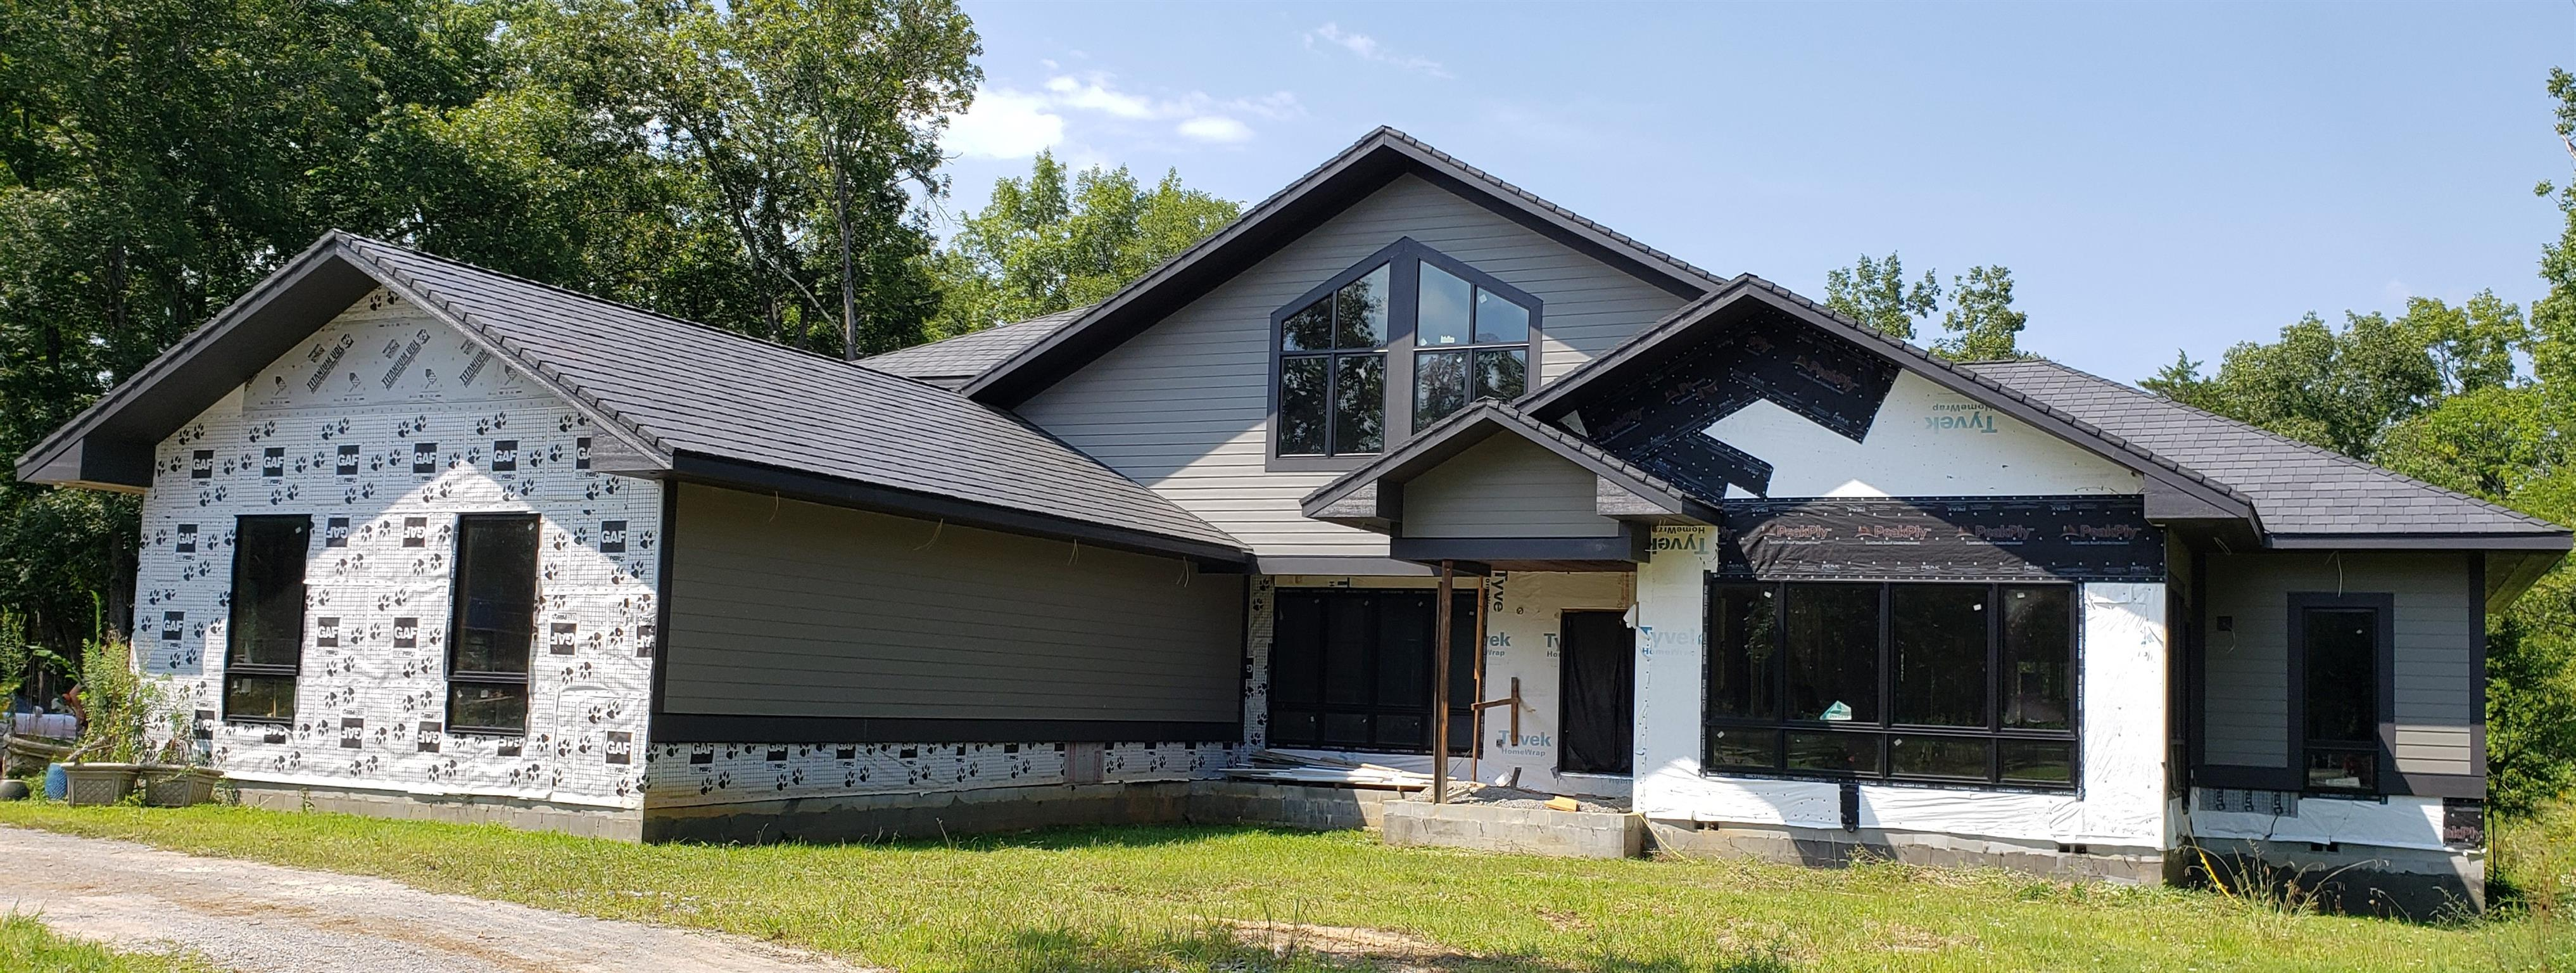 8273 Blankenship Rd, Christiana, TN 37037 - Christiana, TN real estate listing